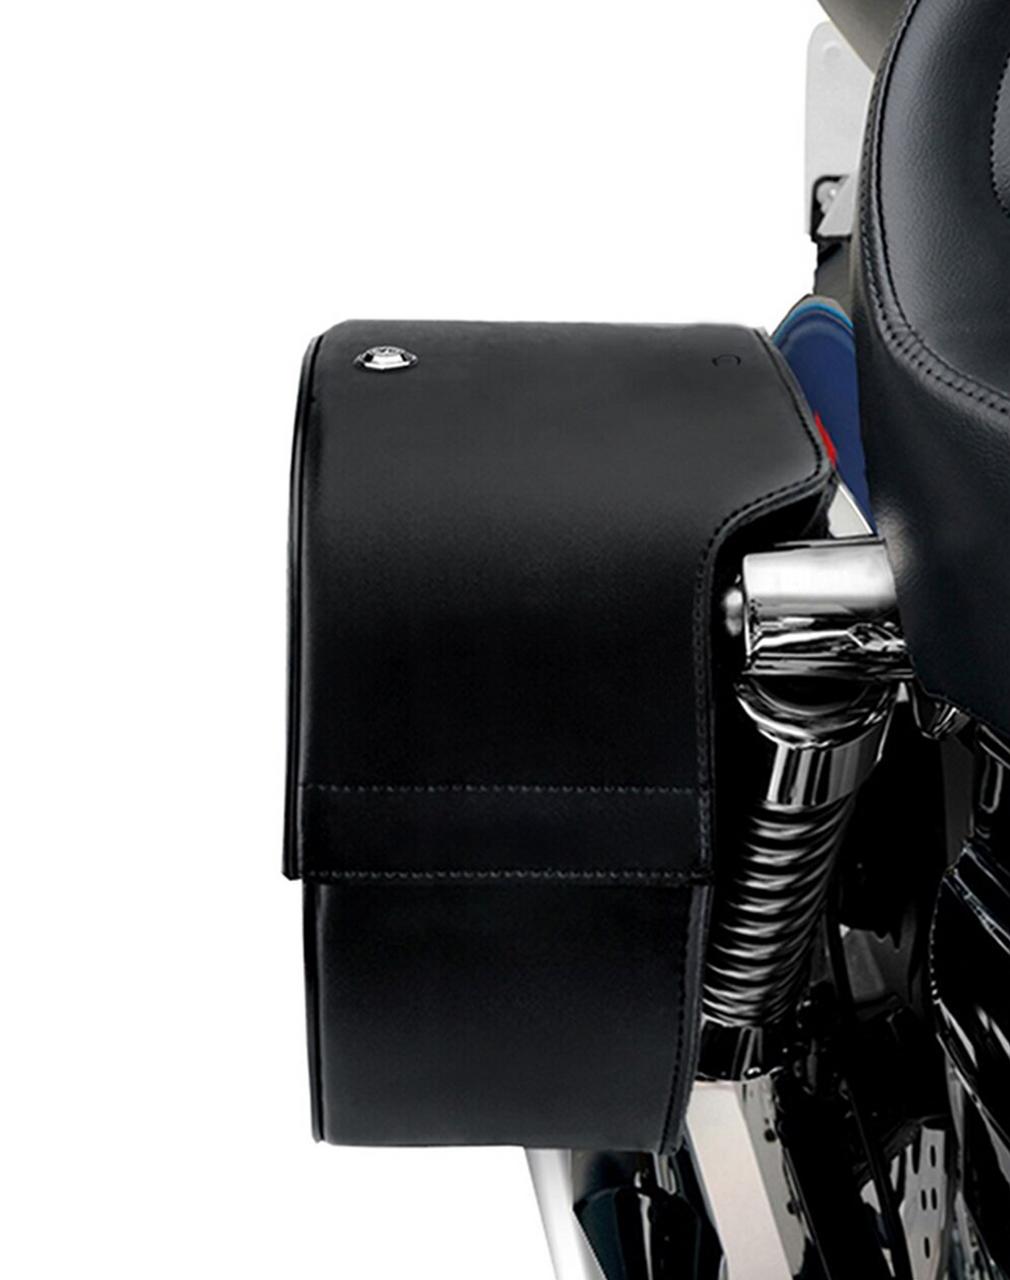 Viking Large Shock Cutout Slanted Studded Motorcycle Saddlebags For Harley Sportster Iron 1200 Shock cutout view